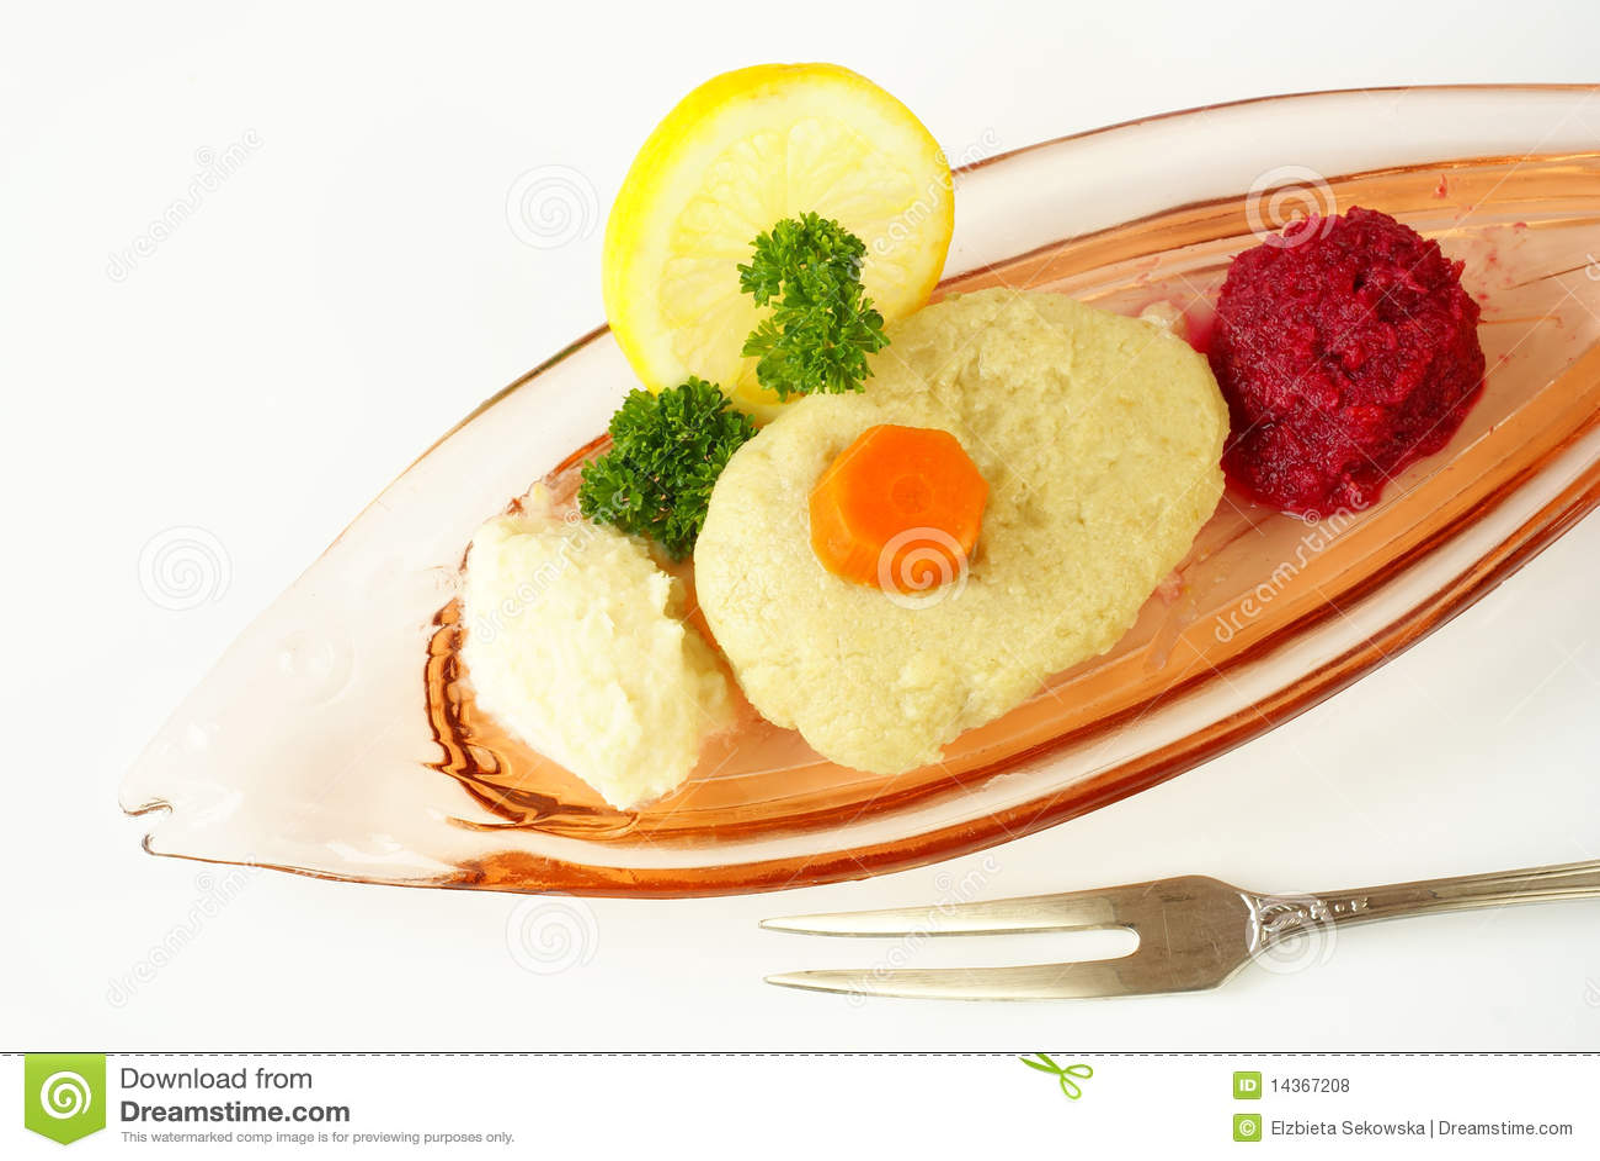 Gefilte fish royalty free stock photos image 14367208 for Jewish fish dish